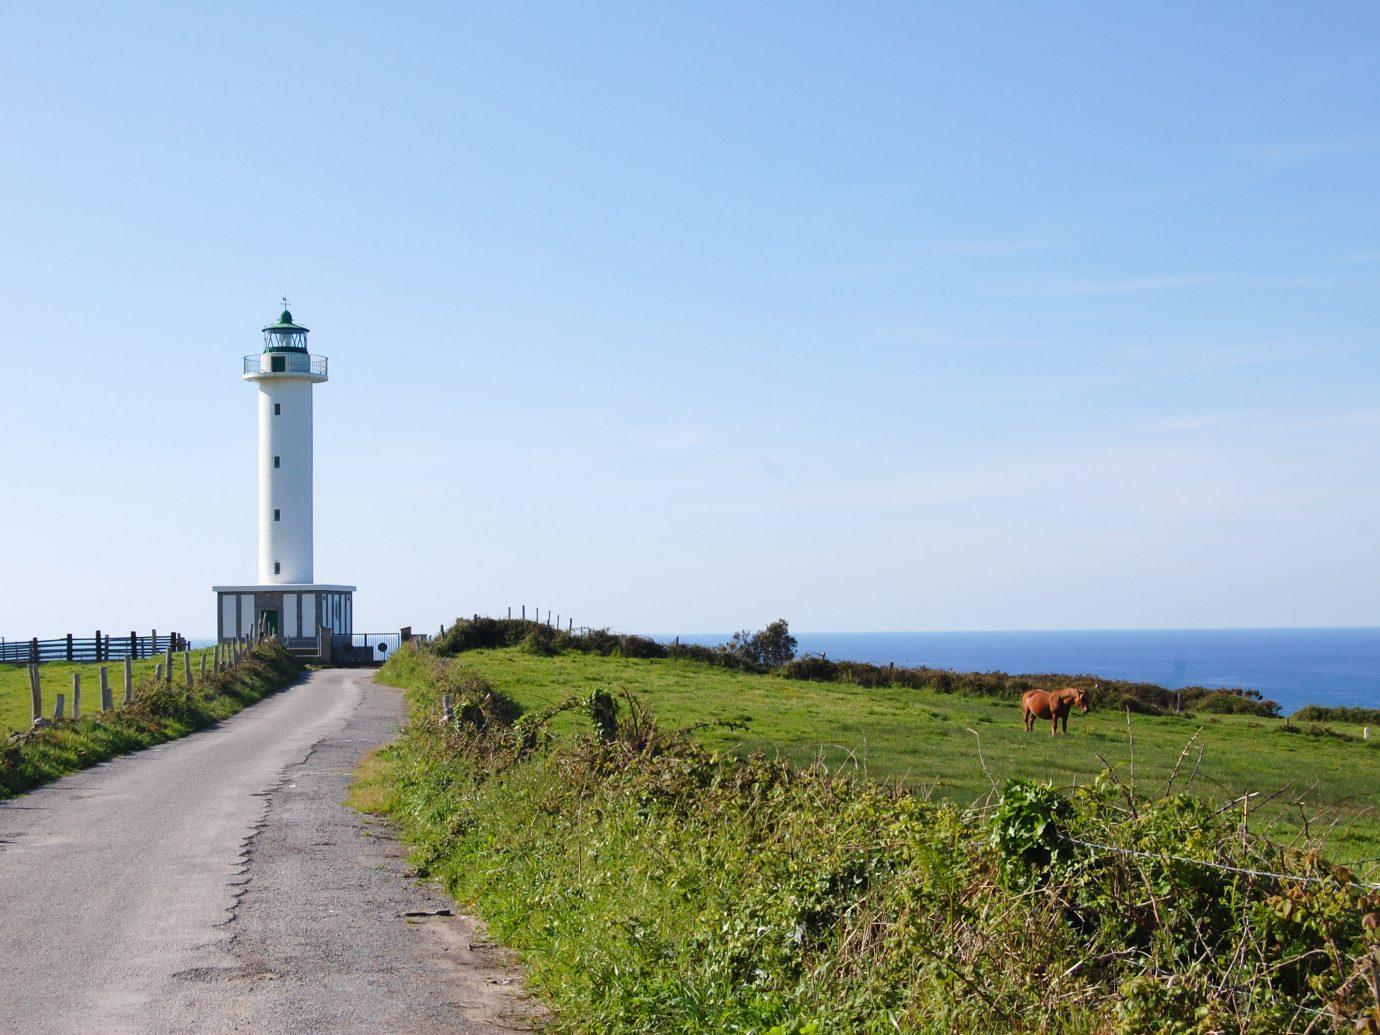 europe Spain Trip Ideas lighthouse Coast sky promontory tower Sea beacon headland shore grass horizon cape land lot Ocean